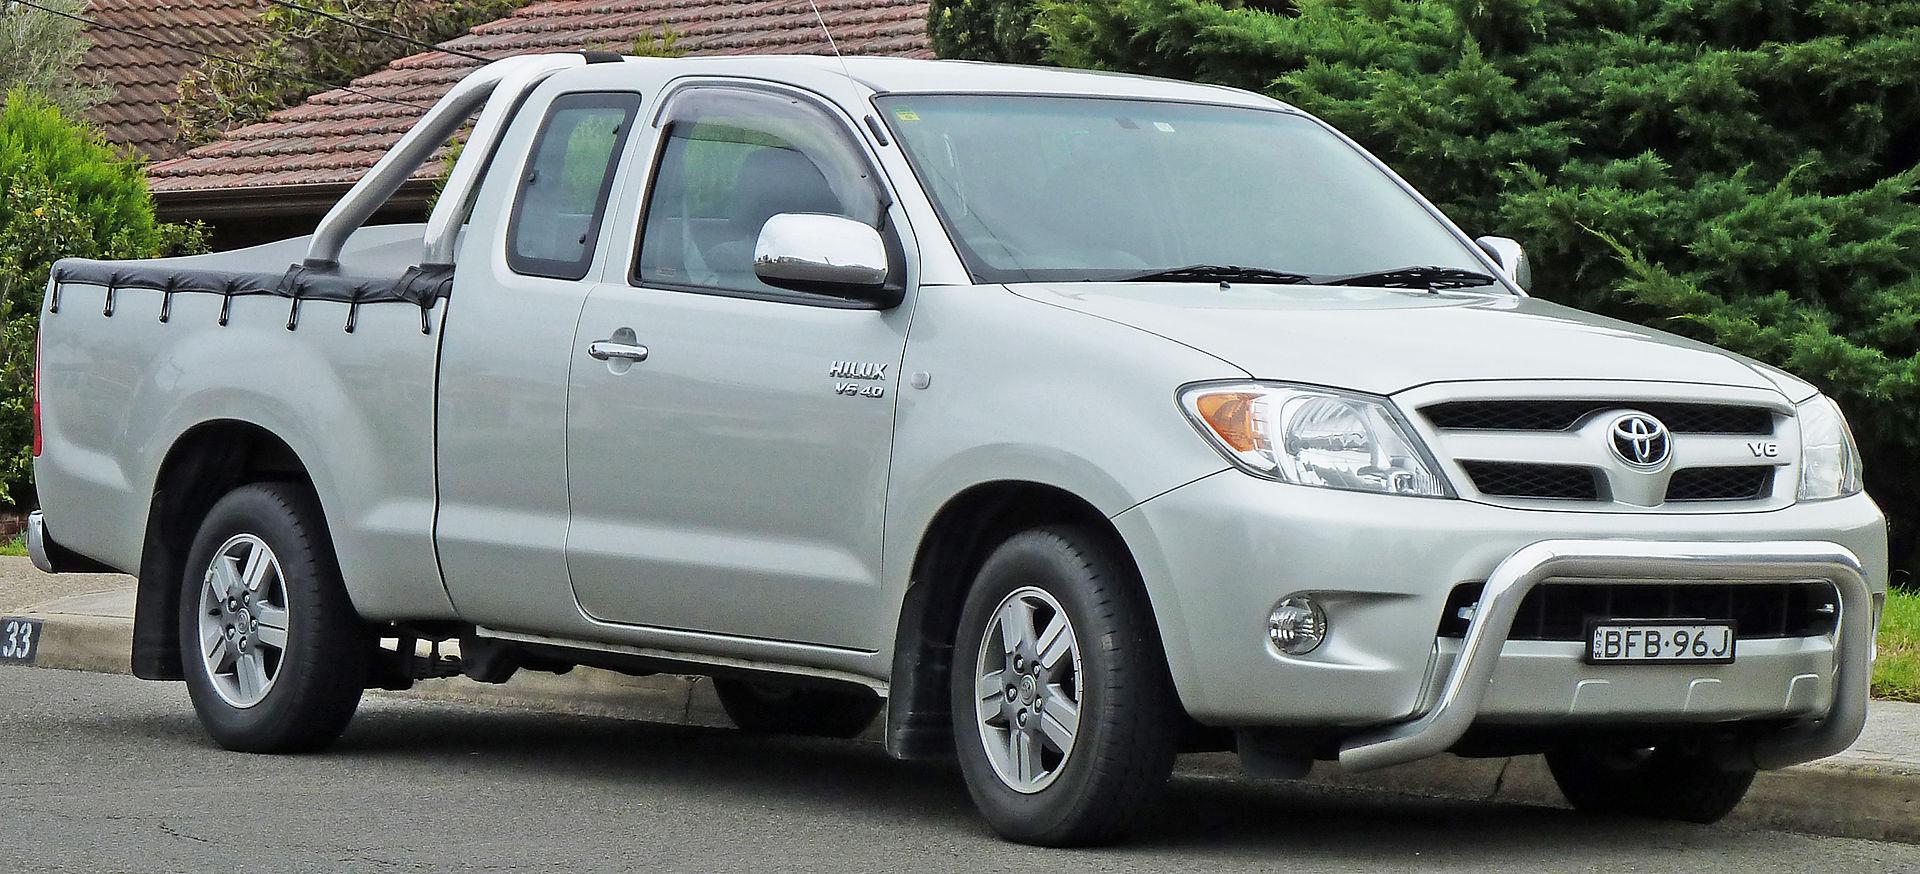 Toyota Hilux Wikip 233 Dia